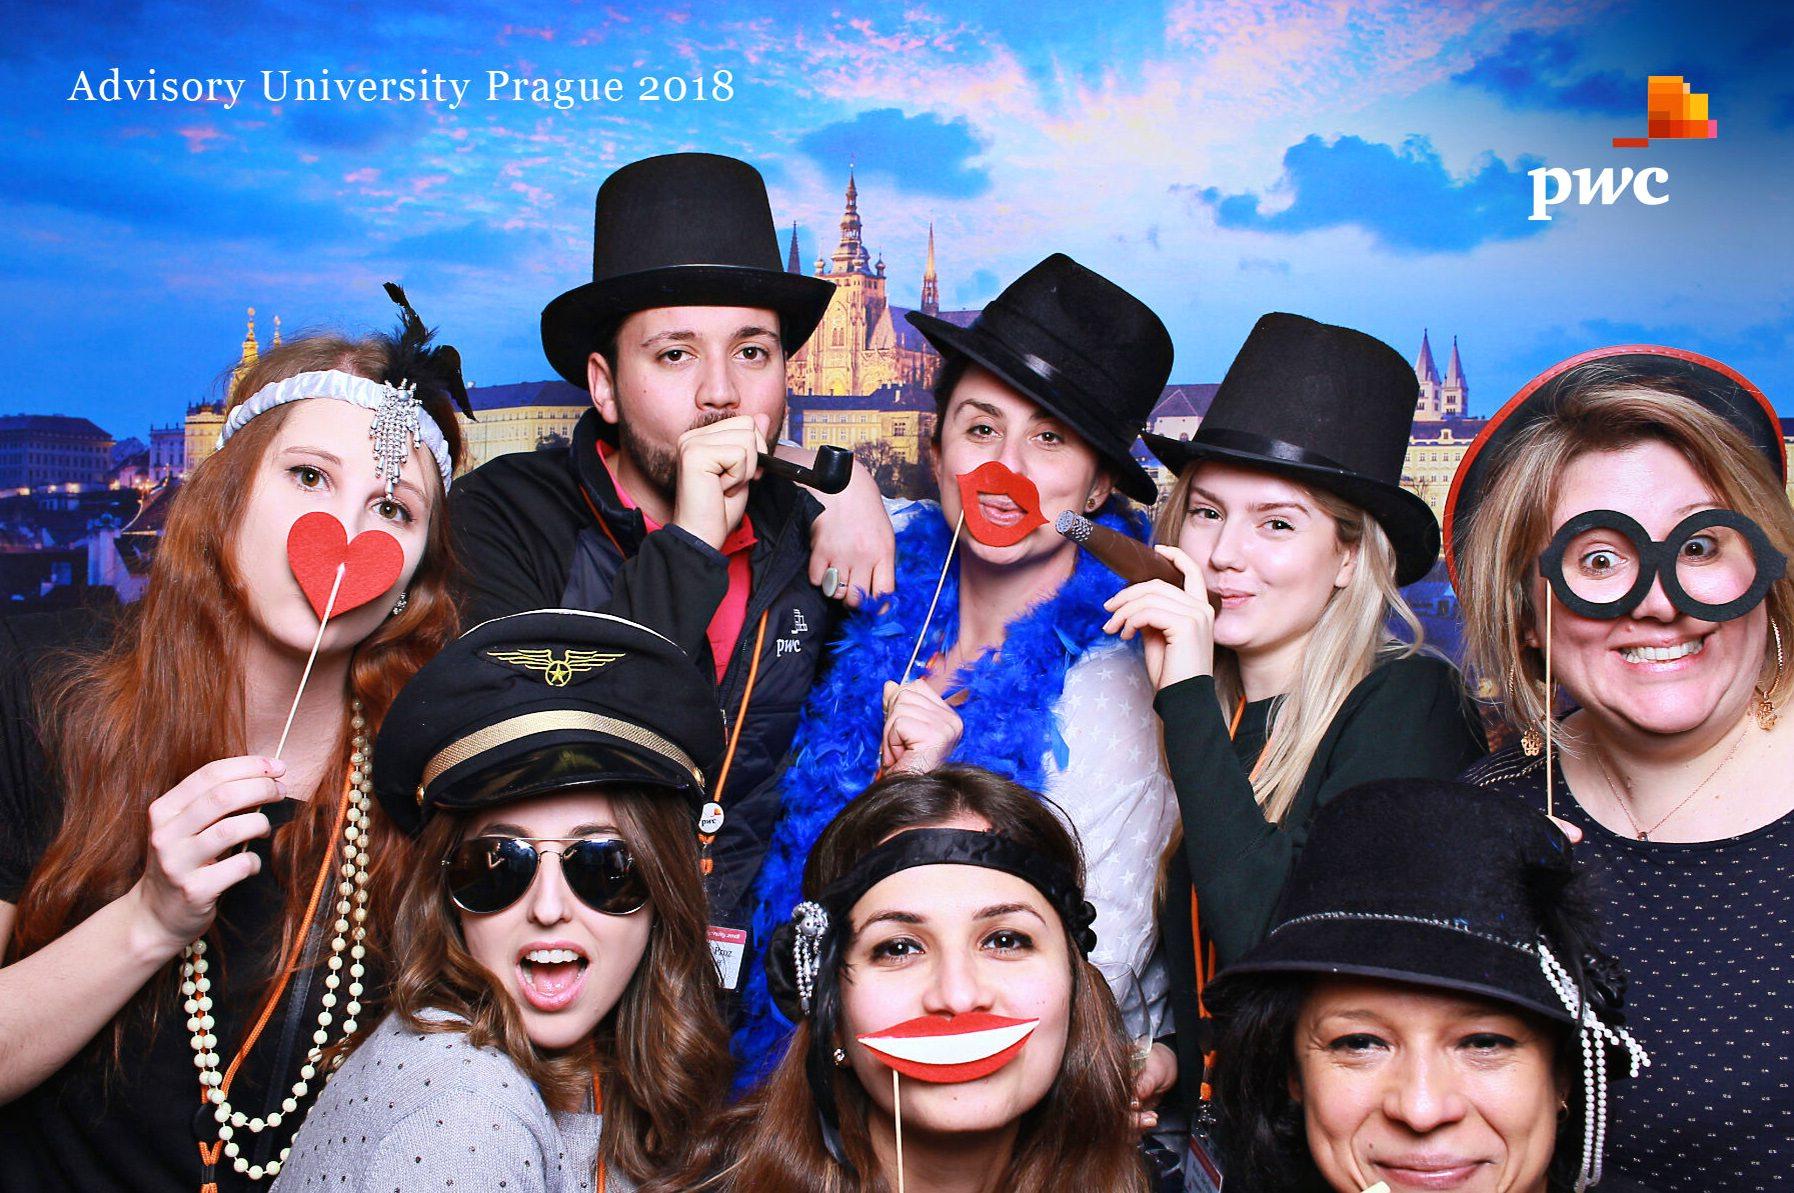 fotokoutek-pwc-advisory-university-prague-11-4-2018-406452